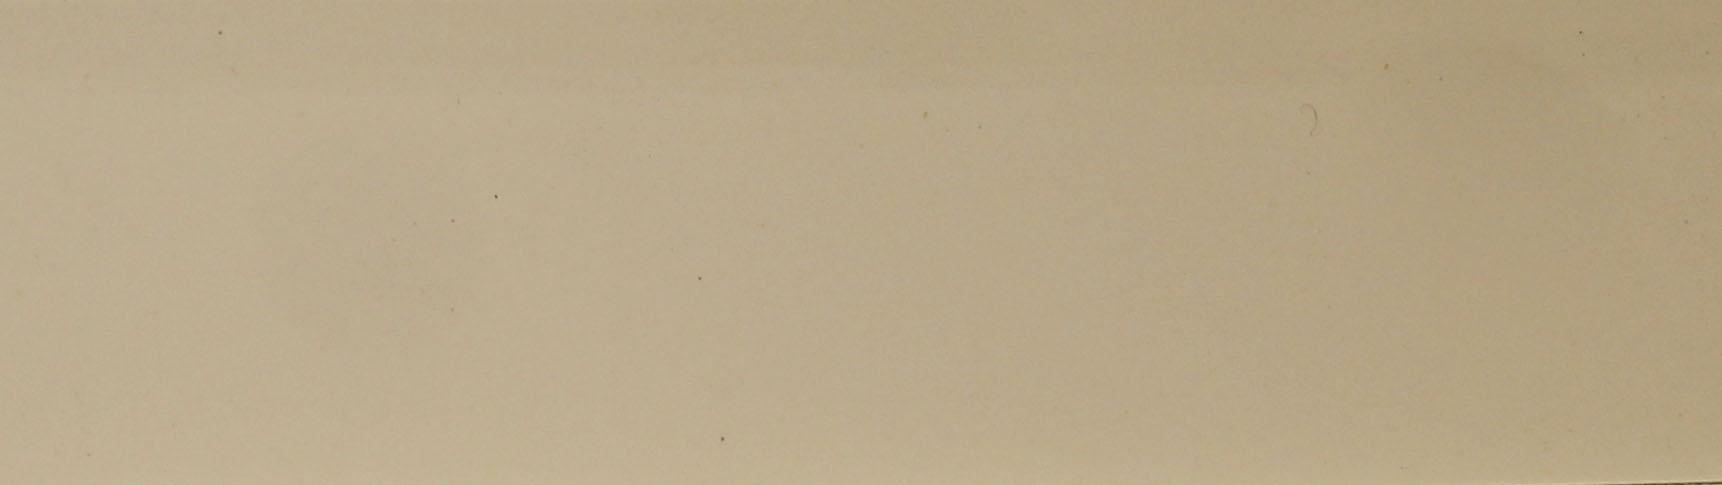 CRY188B -  CRYSTAL CREMA  23 x 1 mm